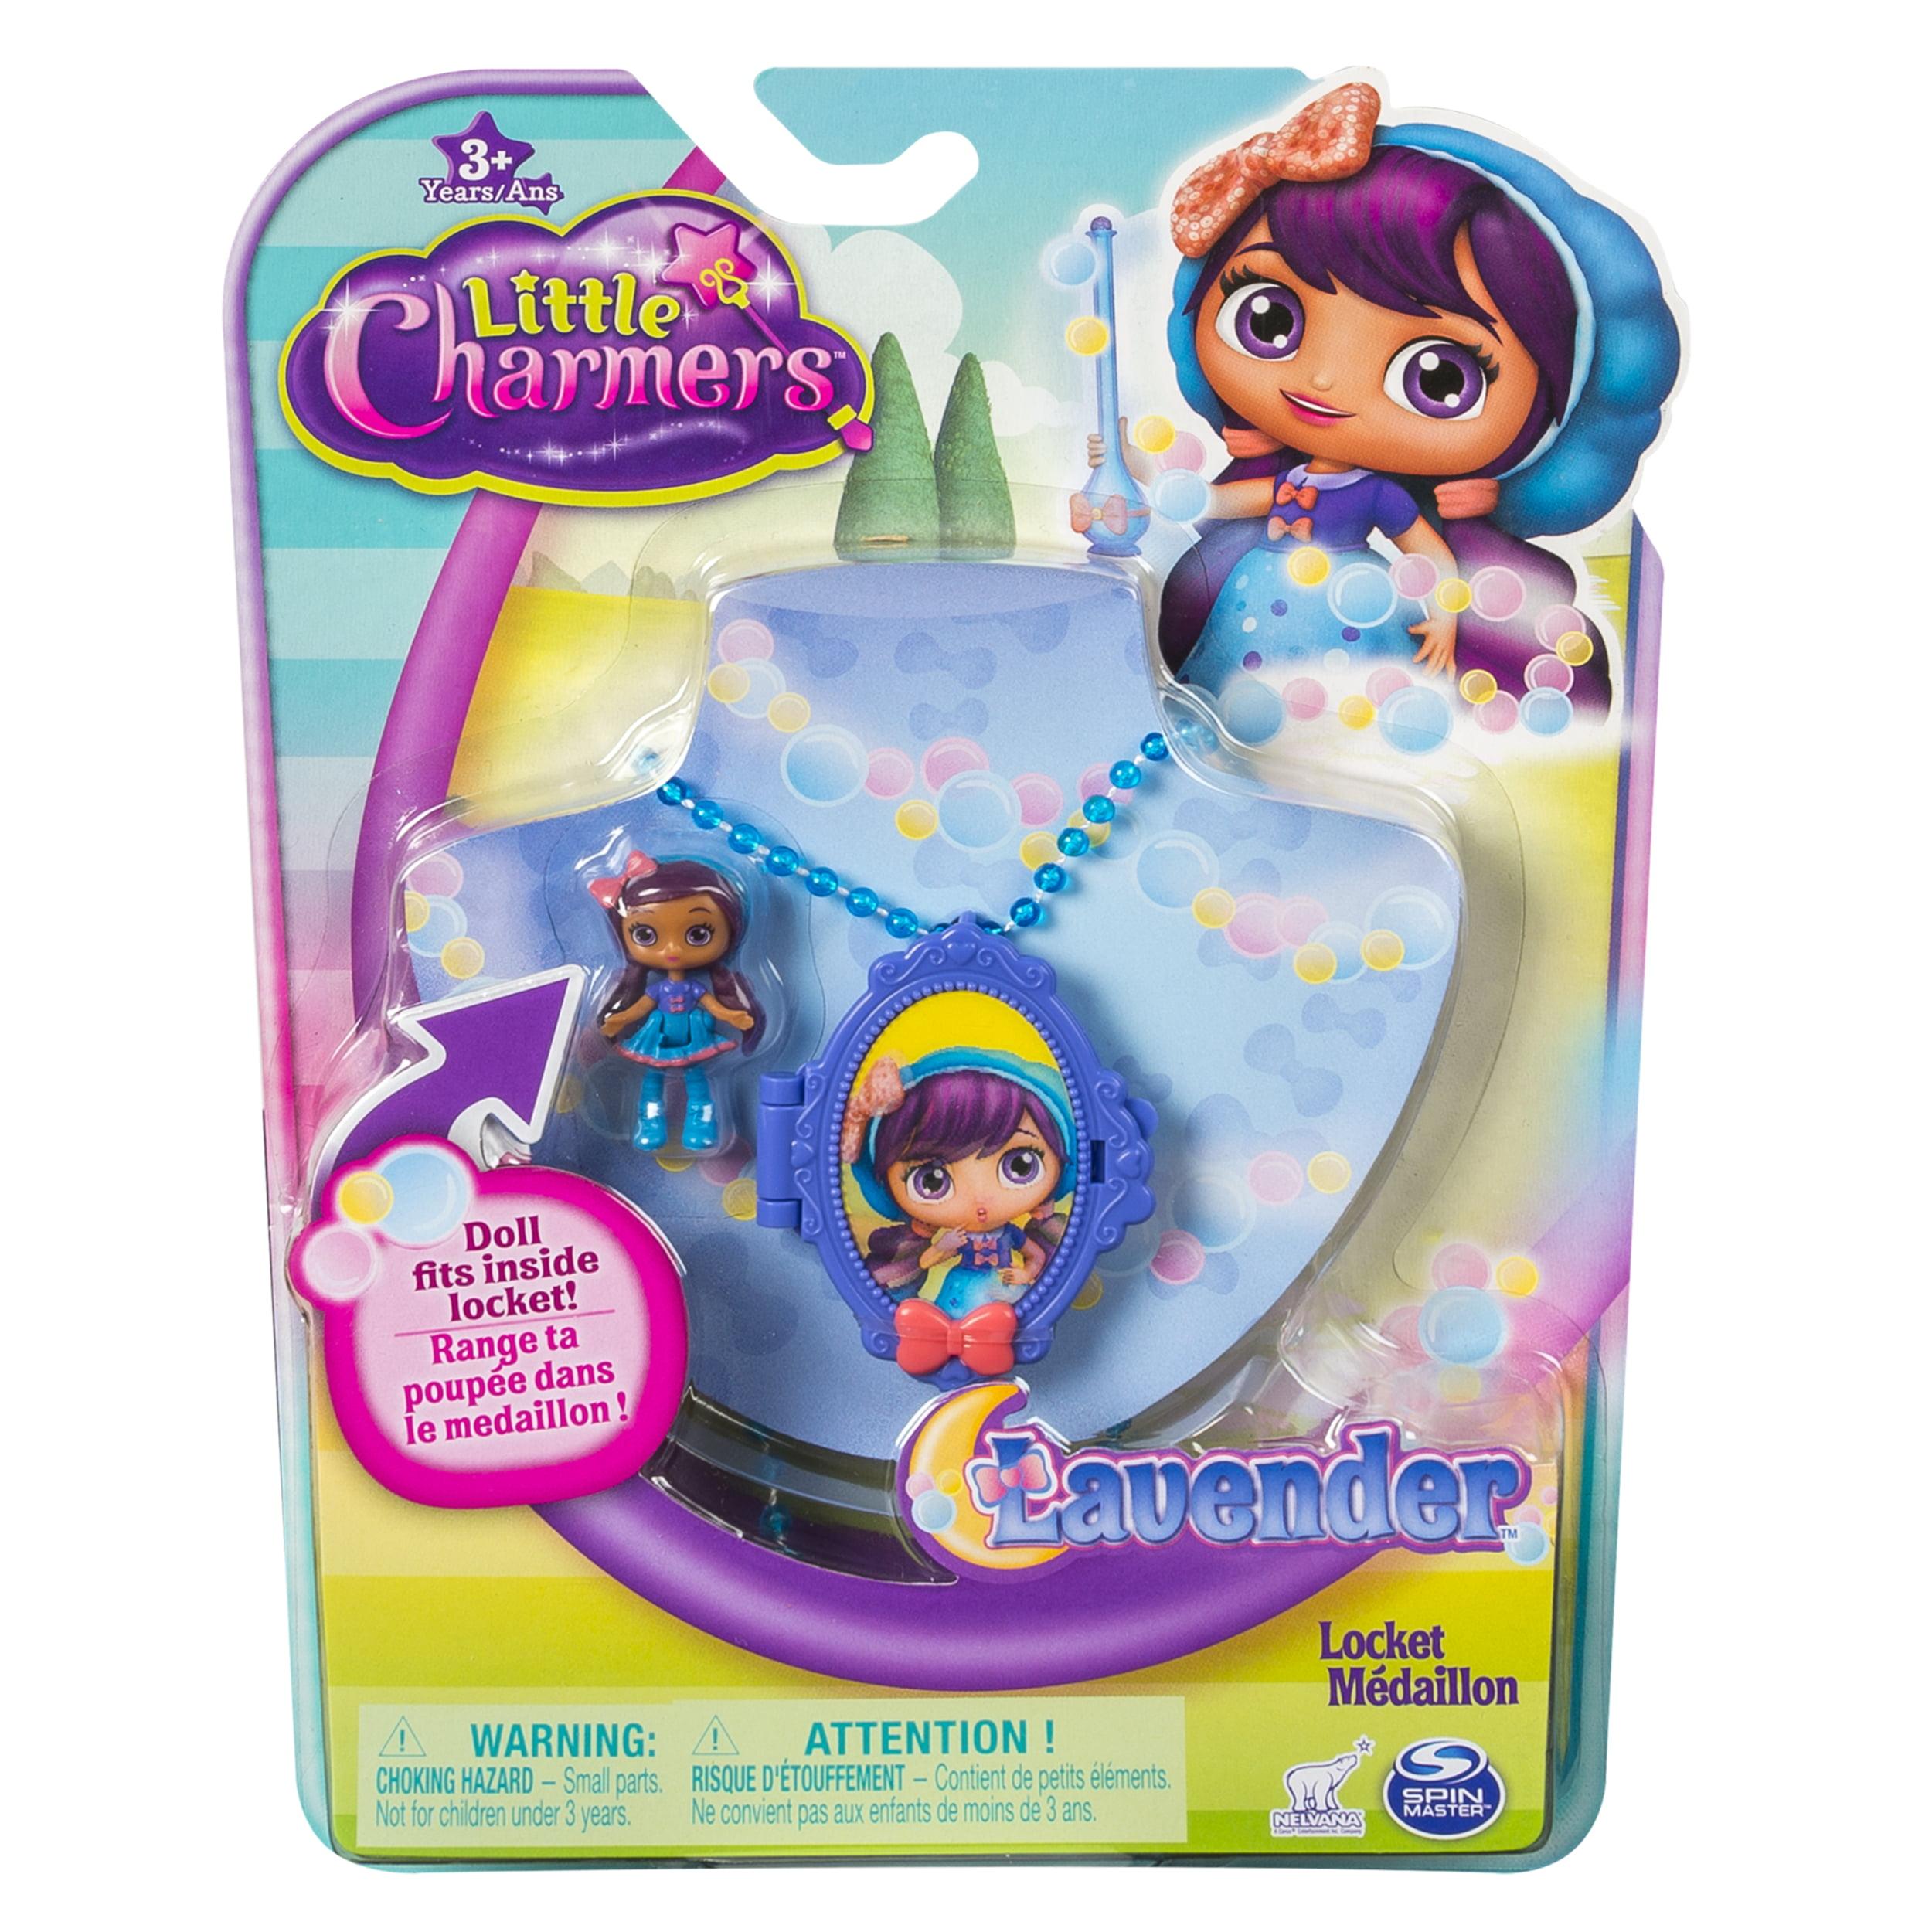 Little Charmers Lavenders Locket